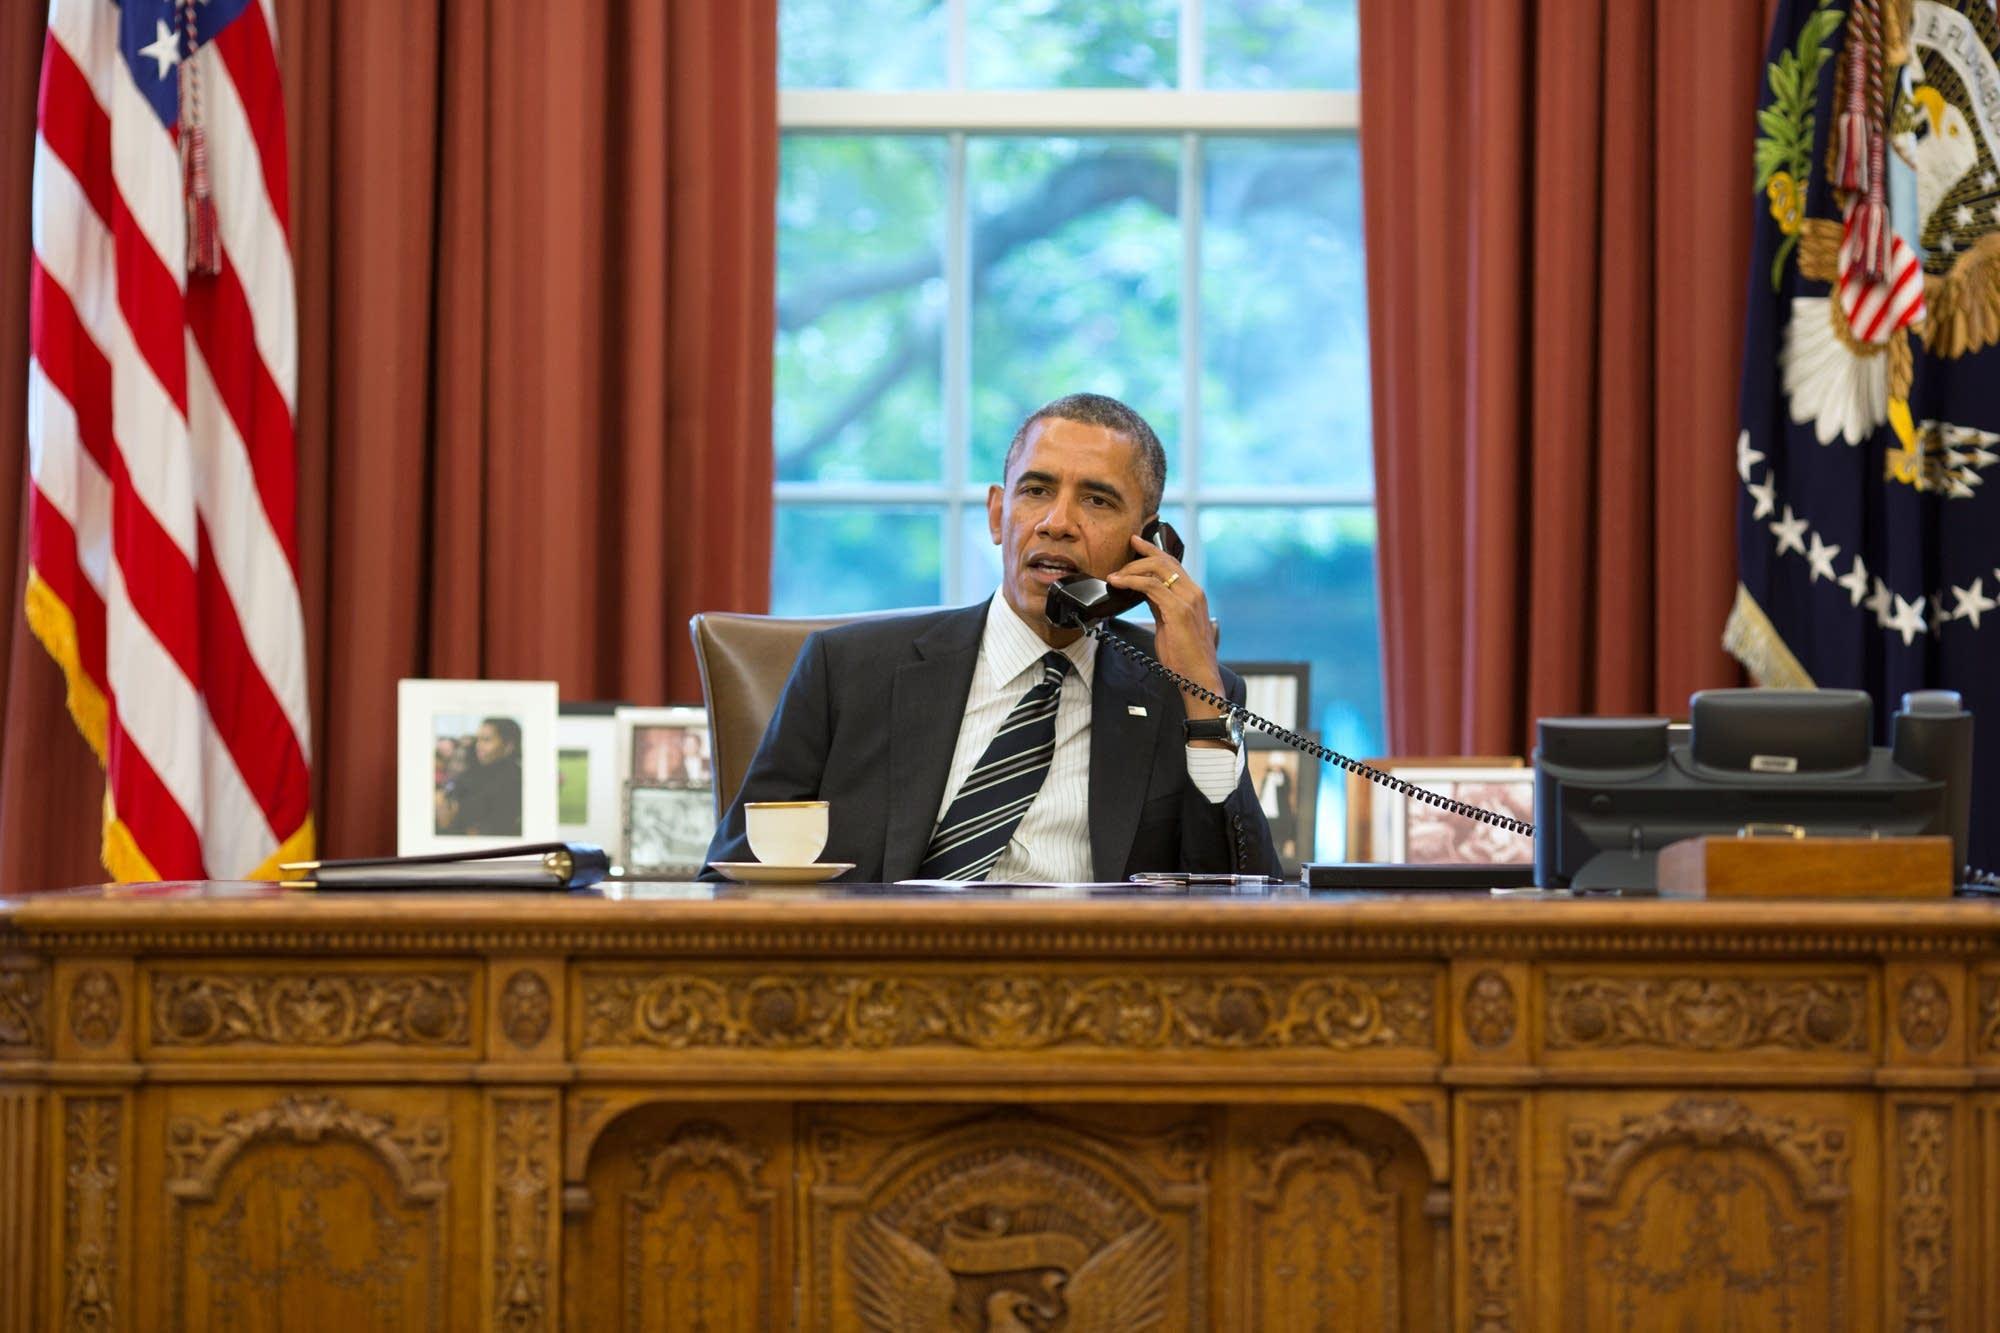 Barack Obama, photo by Pete Souza